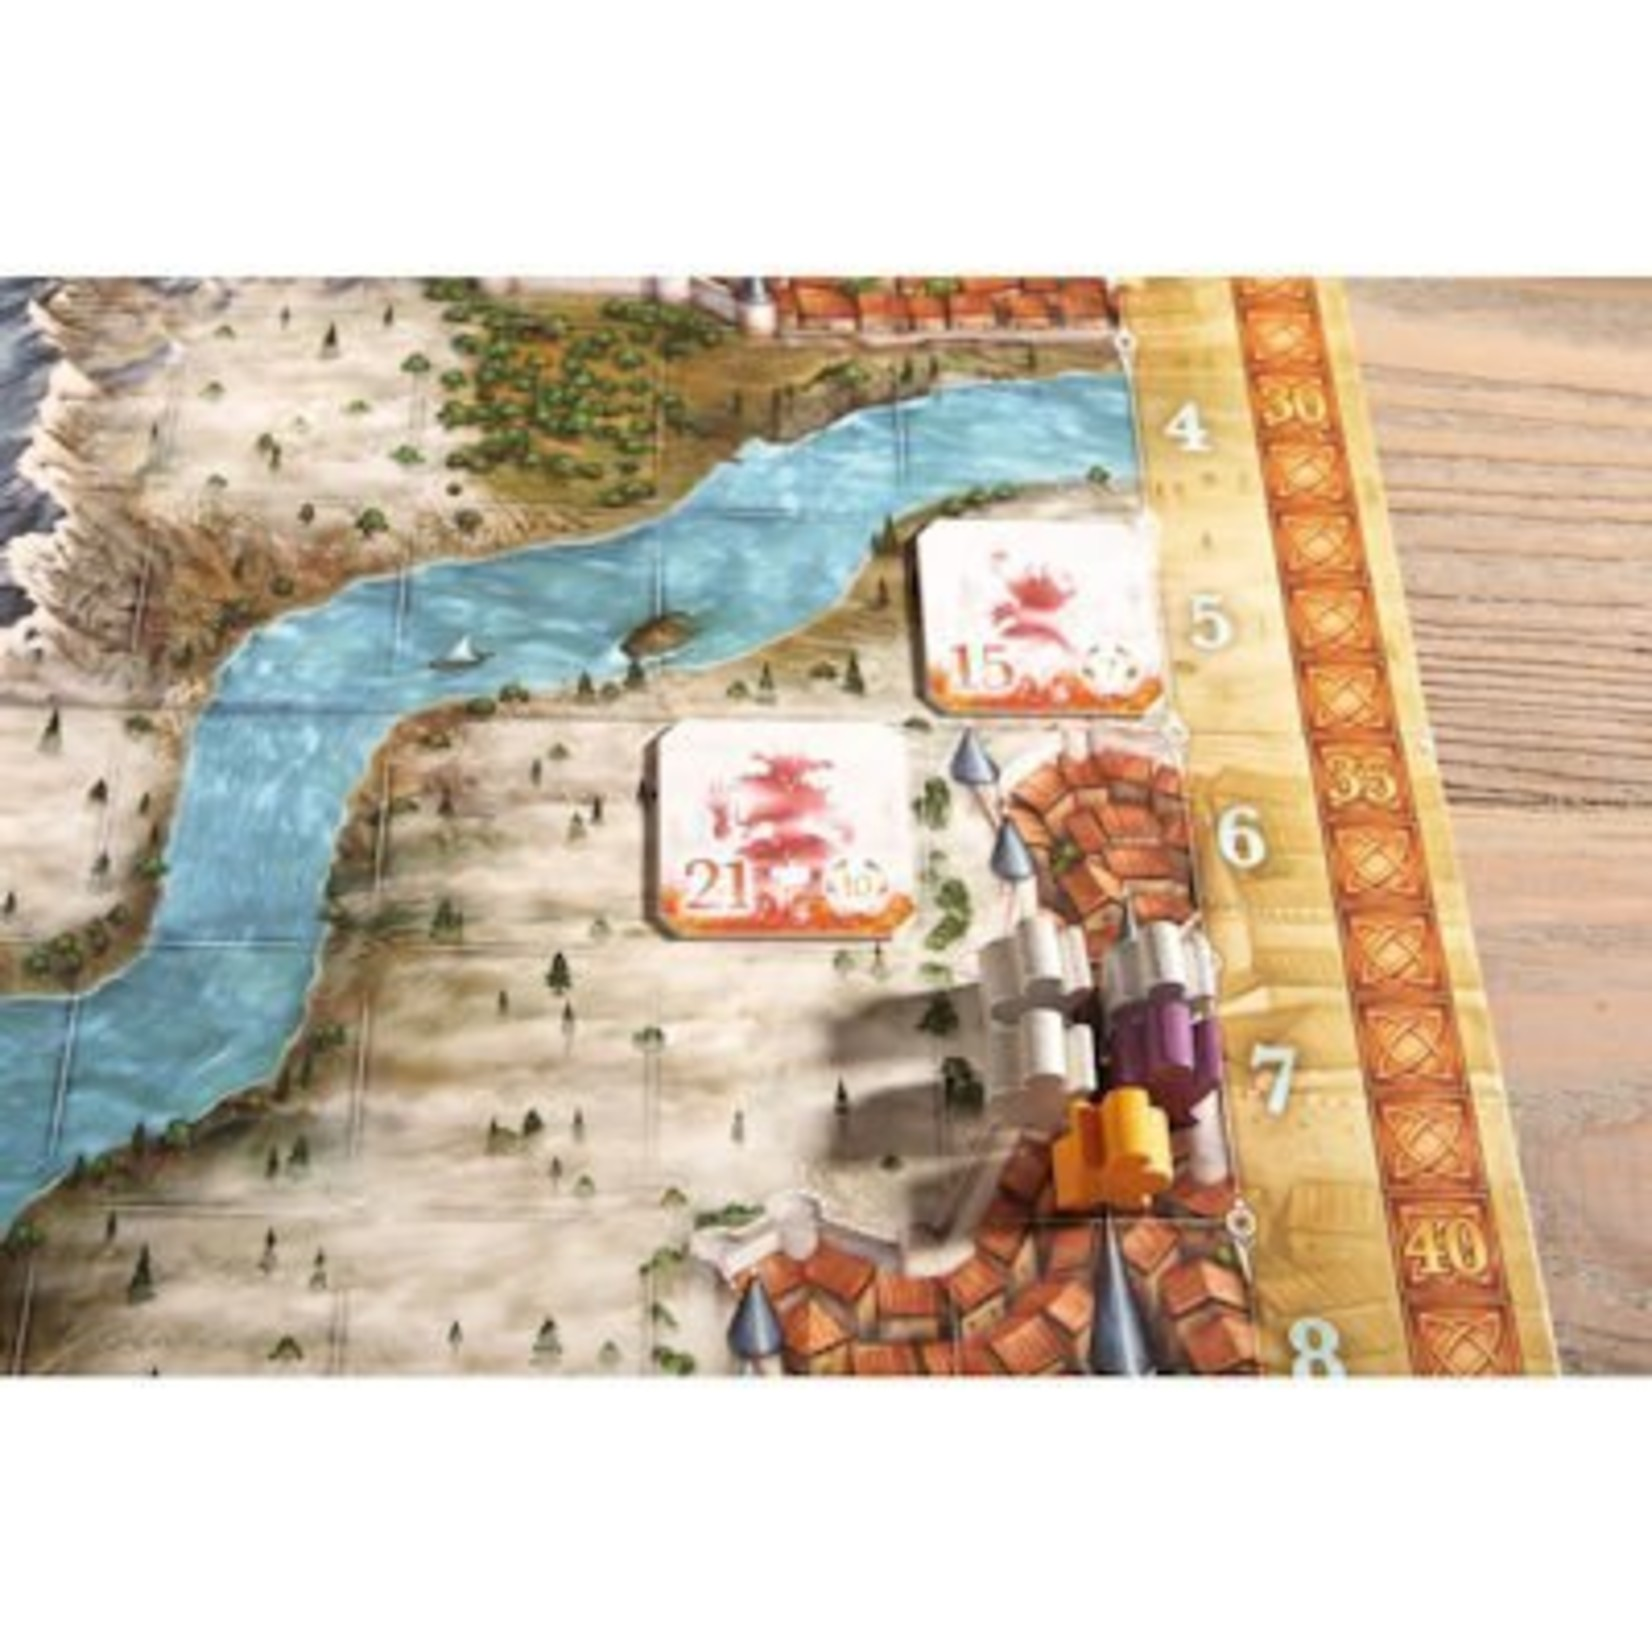 Haba Spel - Avonturenland: Koning en prinses PROMO